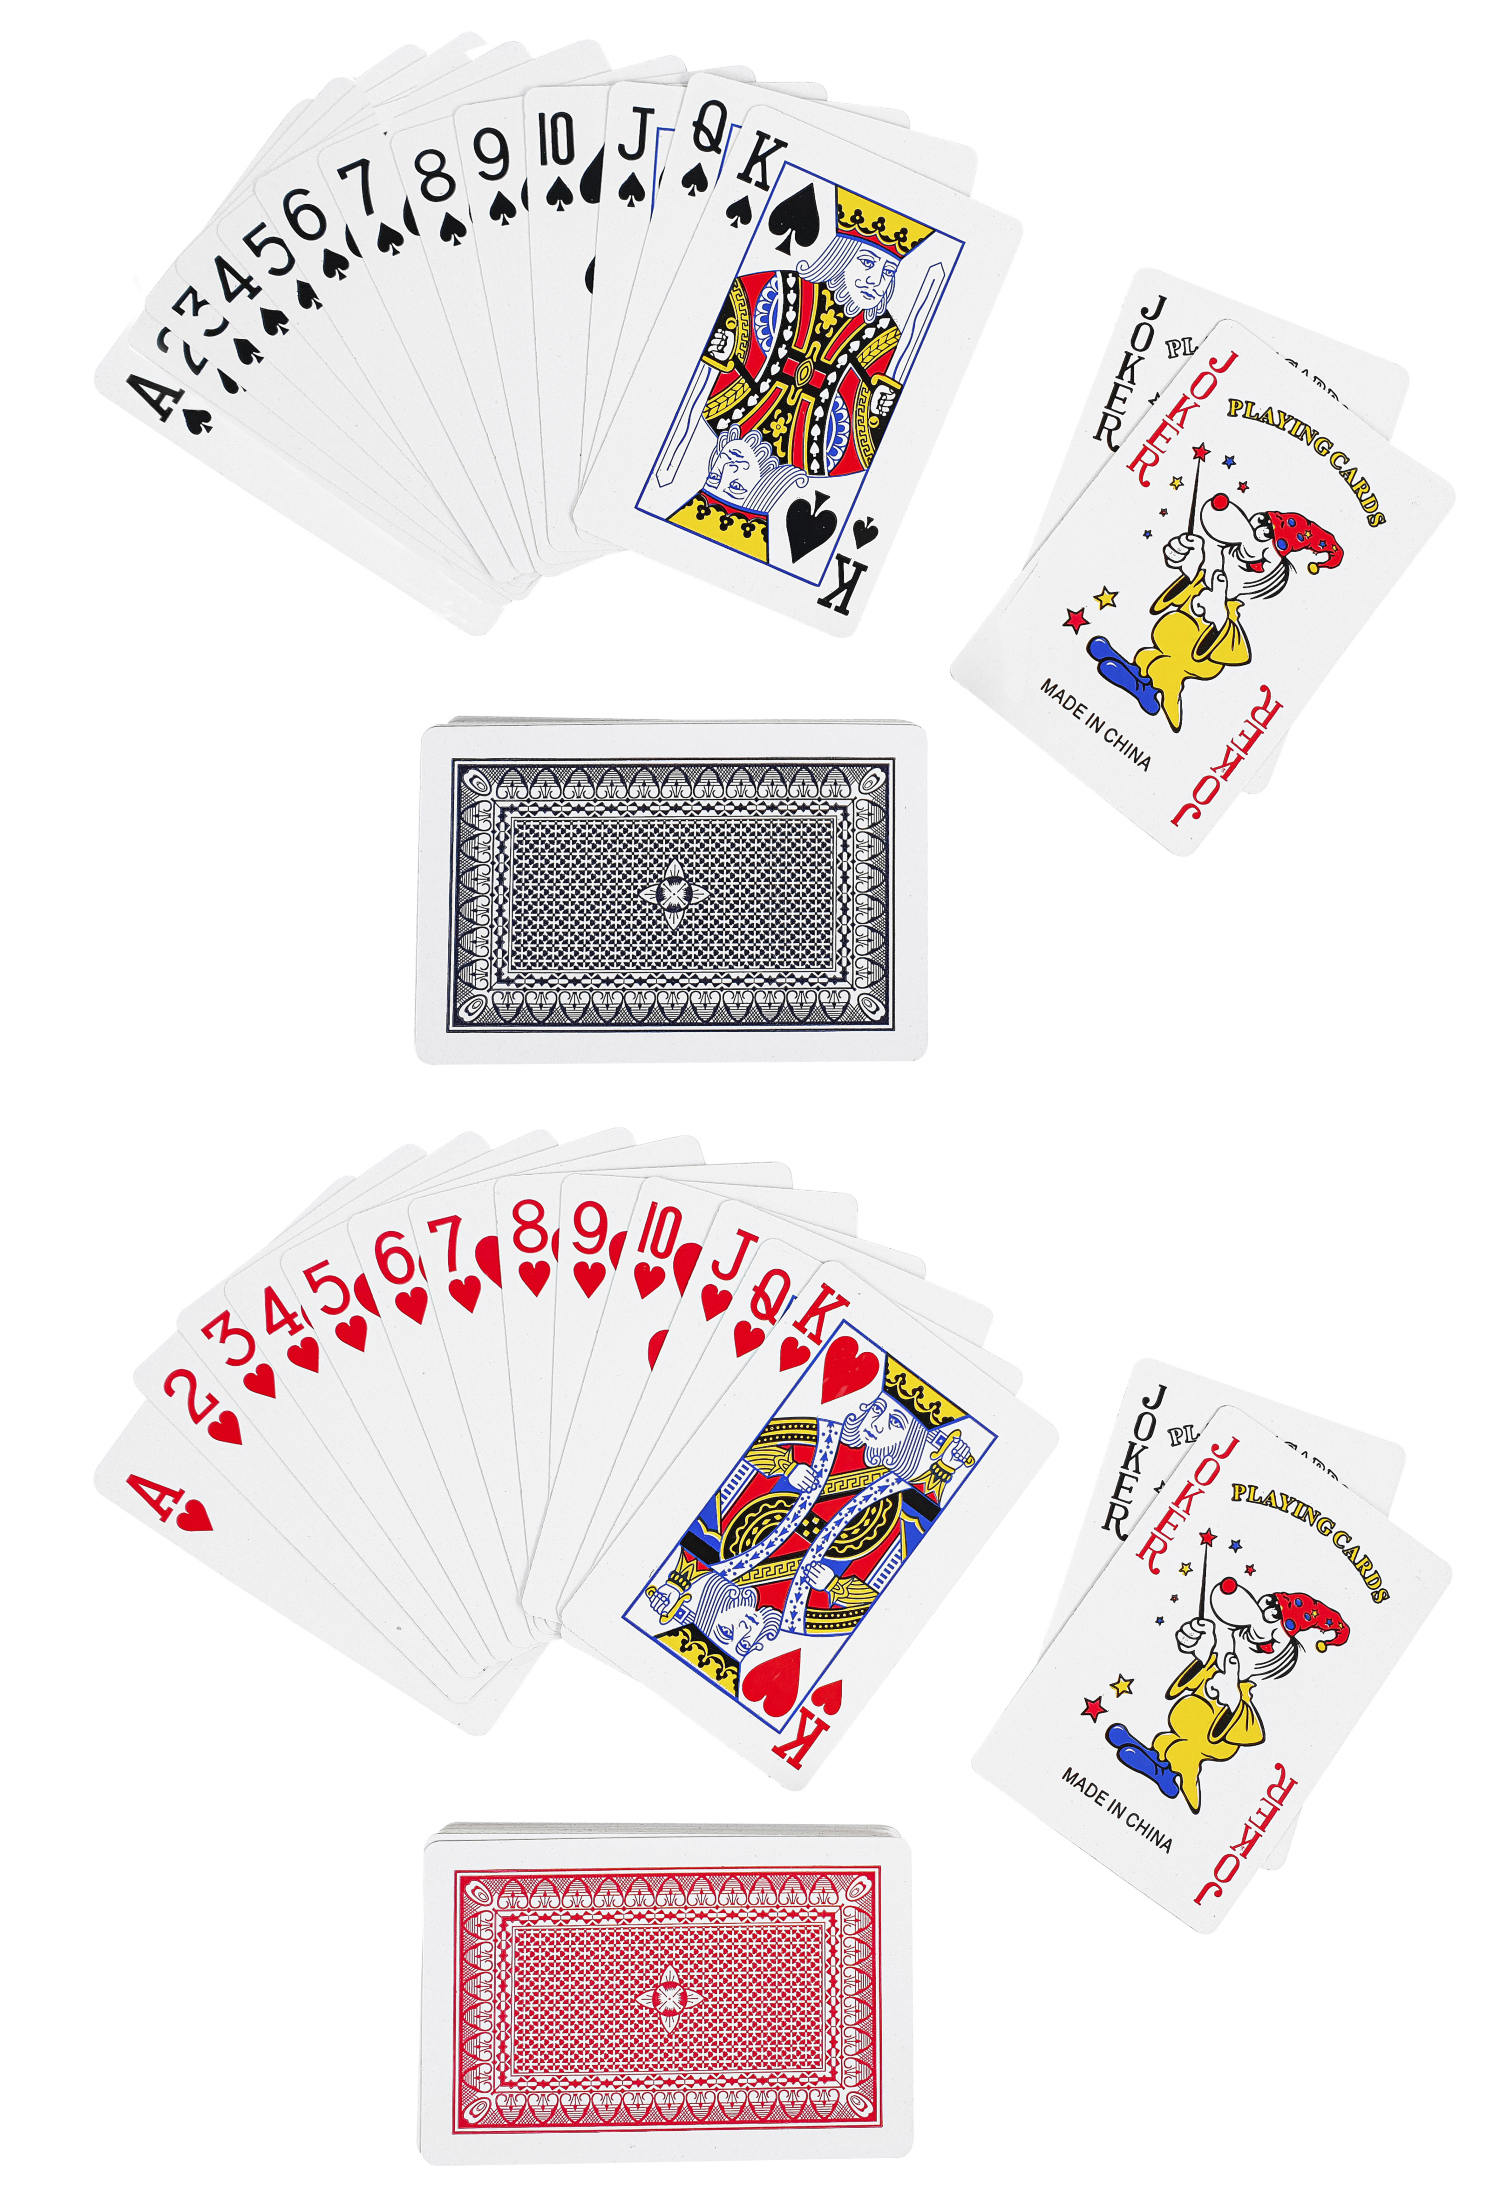 Paypal poker sites